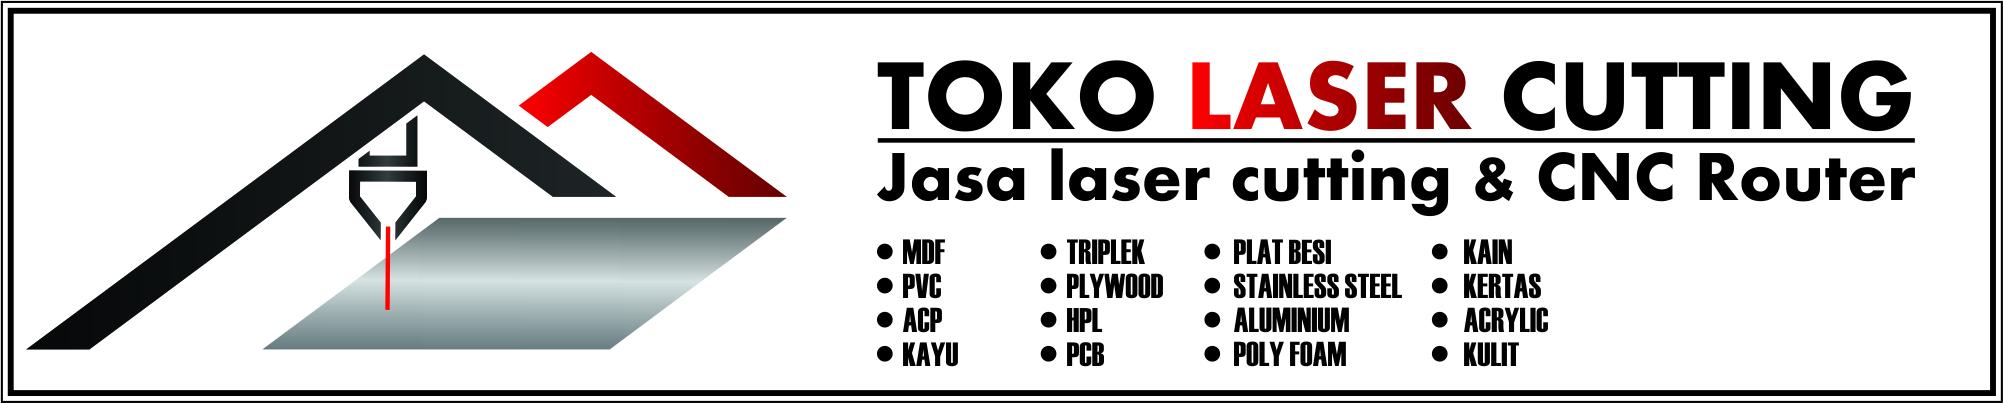 MDF | ACP | PVC | TRIPLEK | ACRYLIC | PLAT BESI | STAINLESS STEEL | ALUMINIUM | KAIN | KERTAS | KULIT